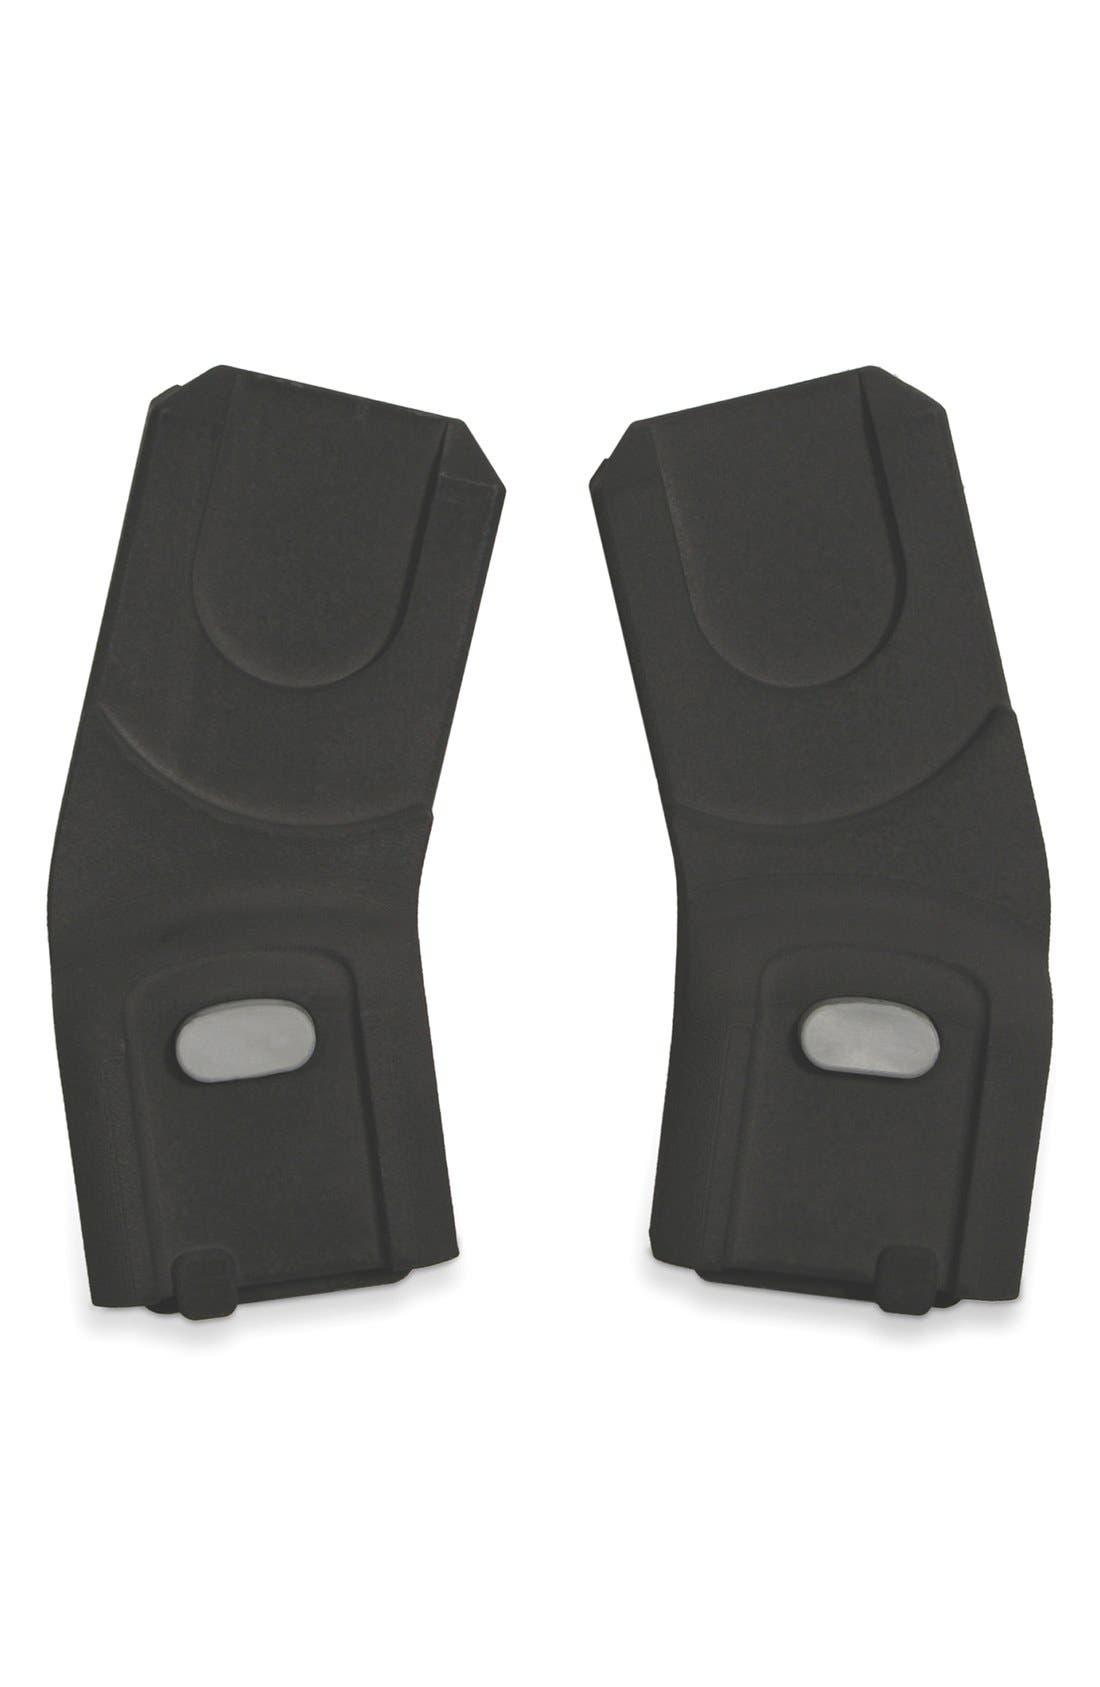 Main Image - UPPAbaby VISTA & CRUZ  Maxi-Cosi® Infant Car Seat Adapter